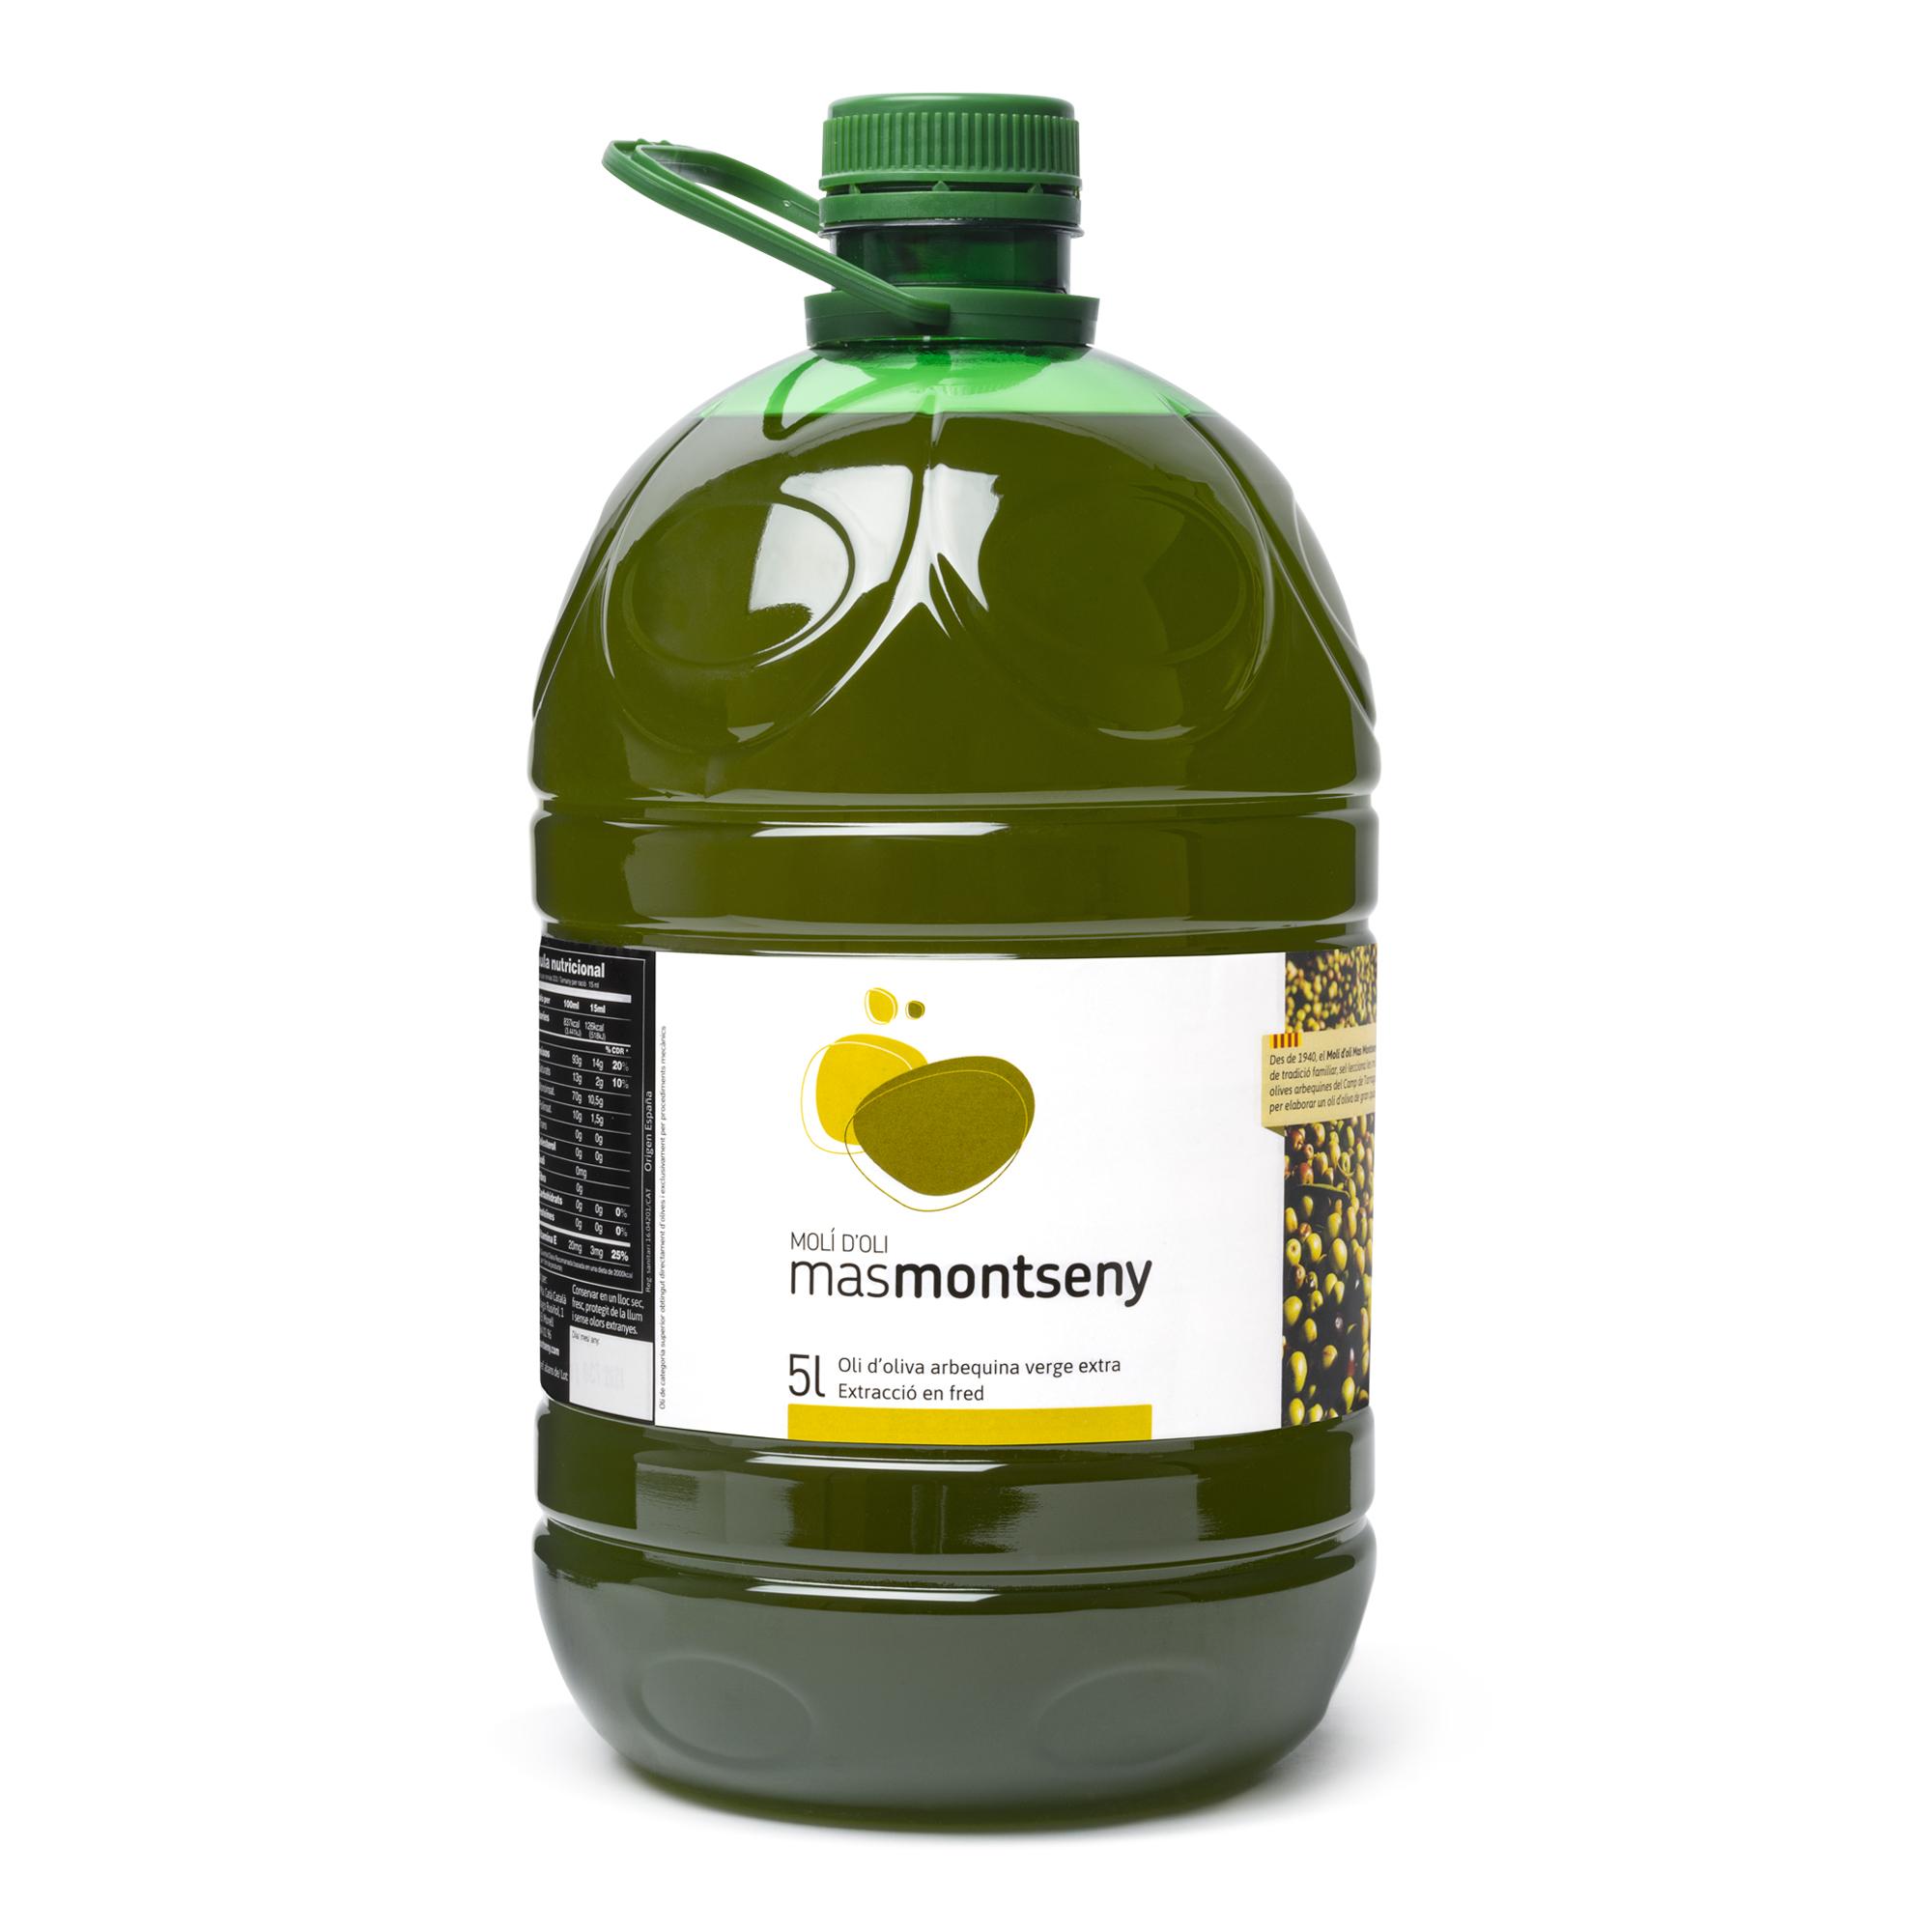 5L Oli d'oliva verge extra Mas Montseny 2020